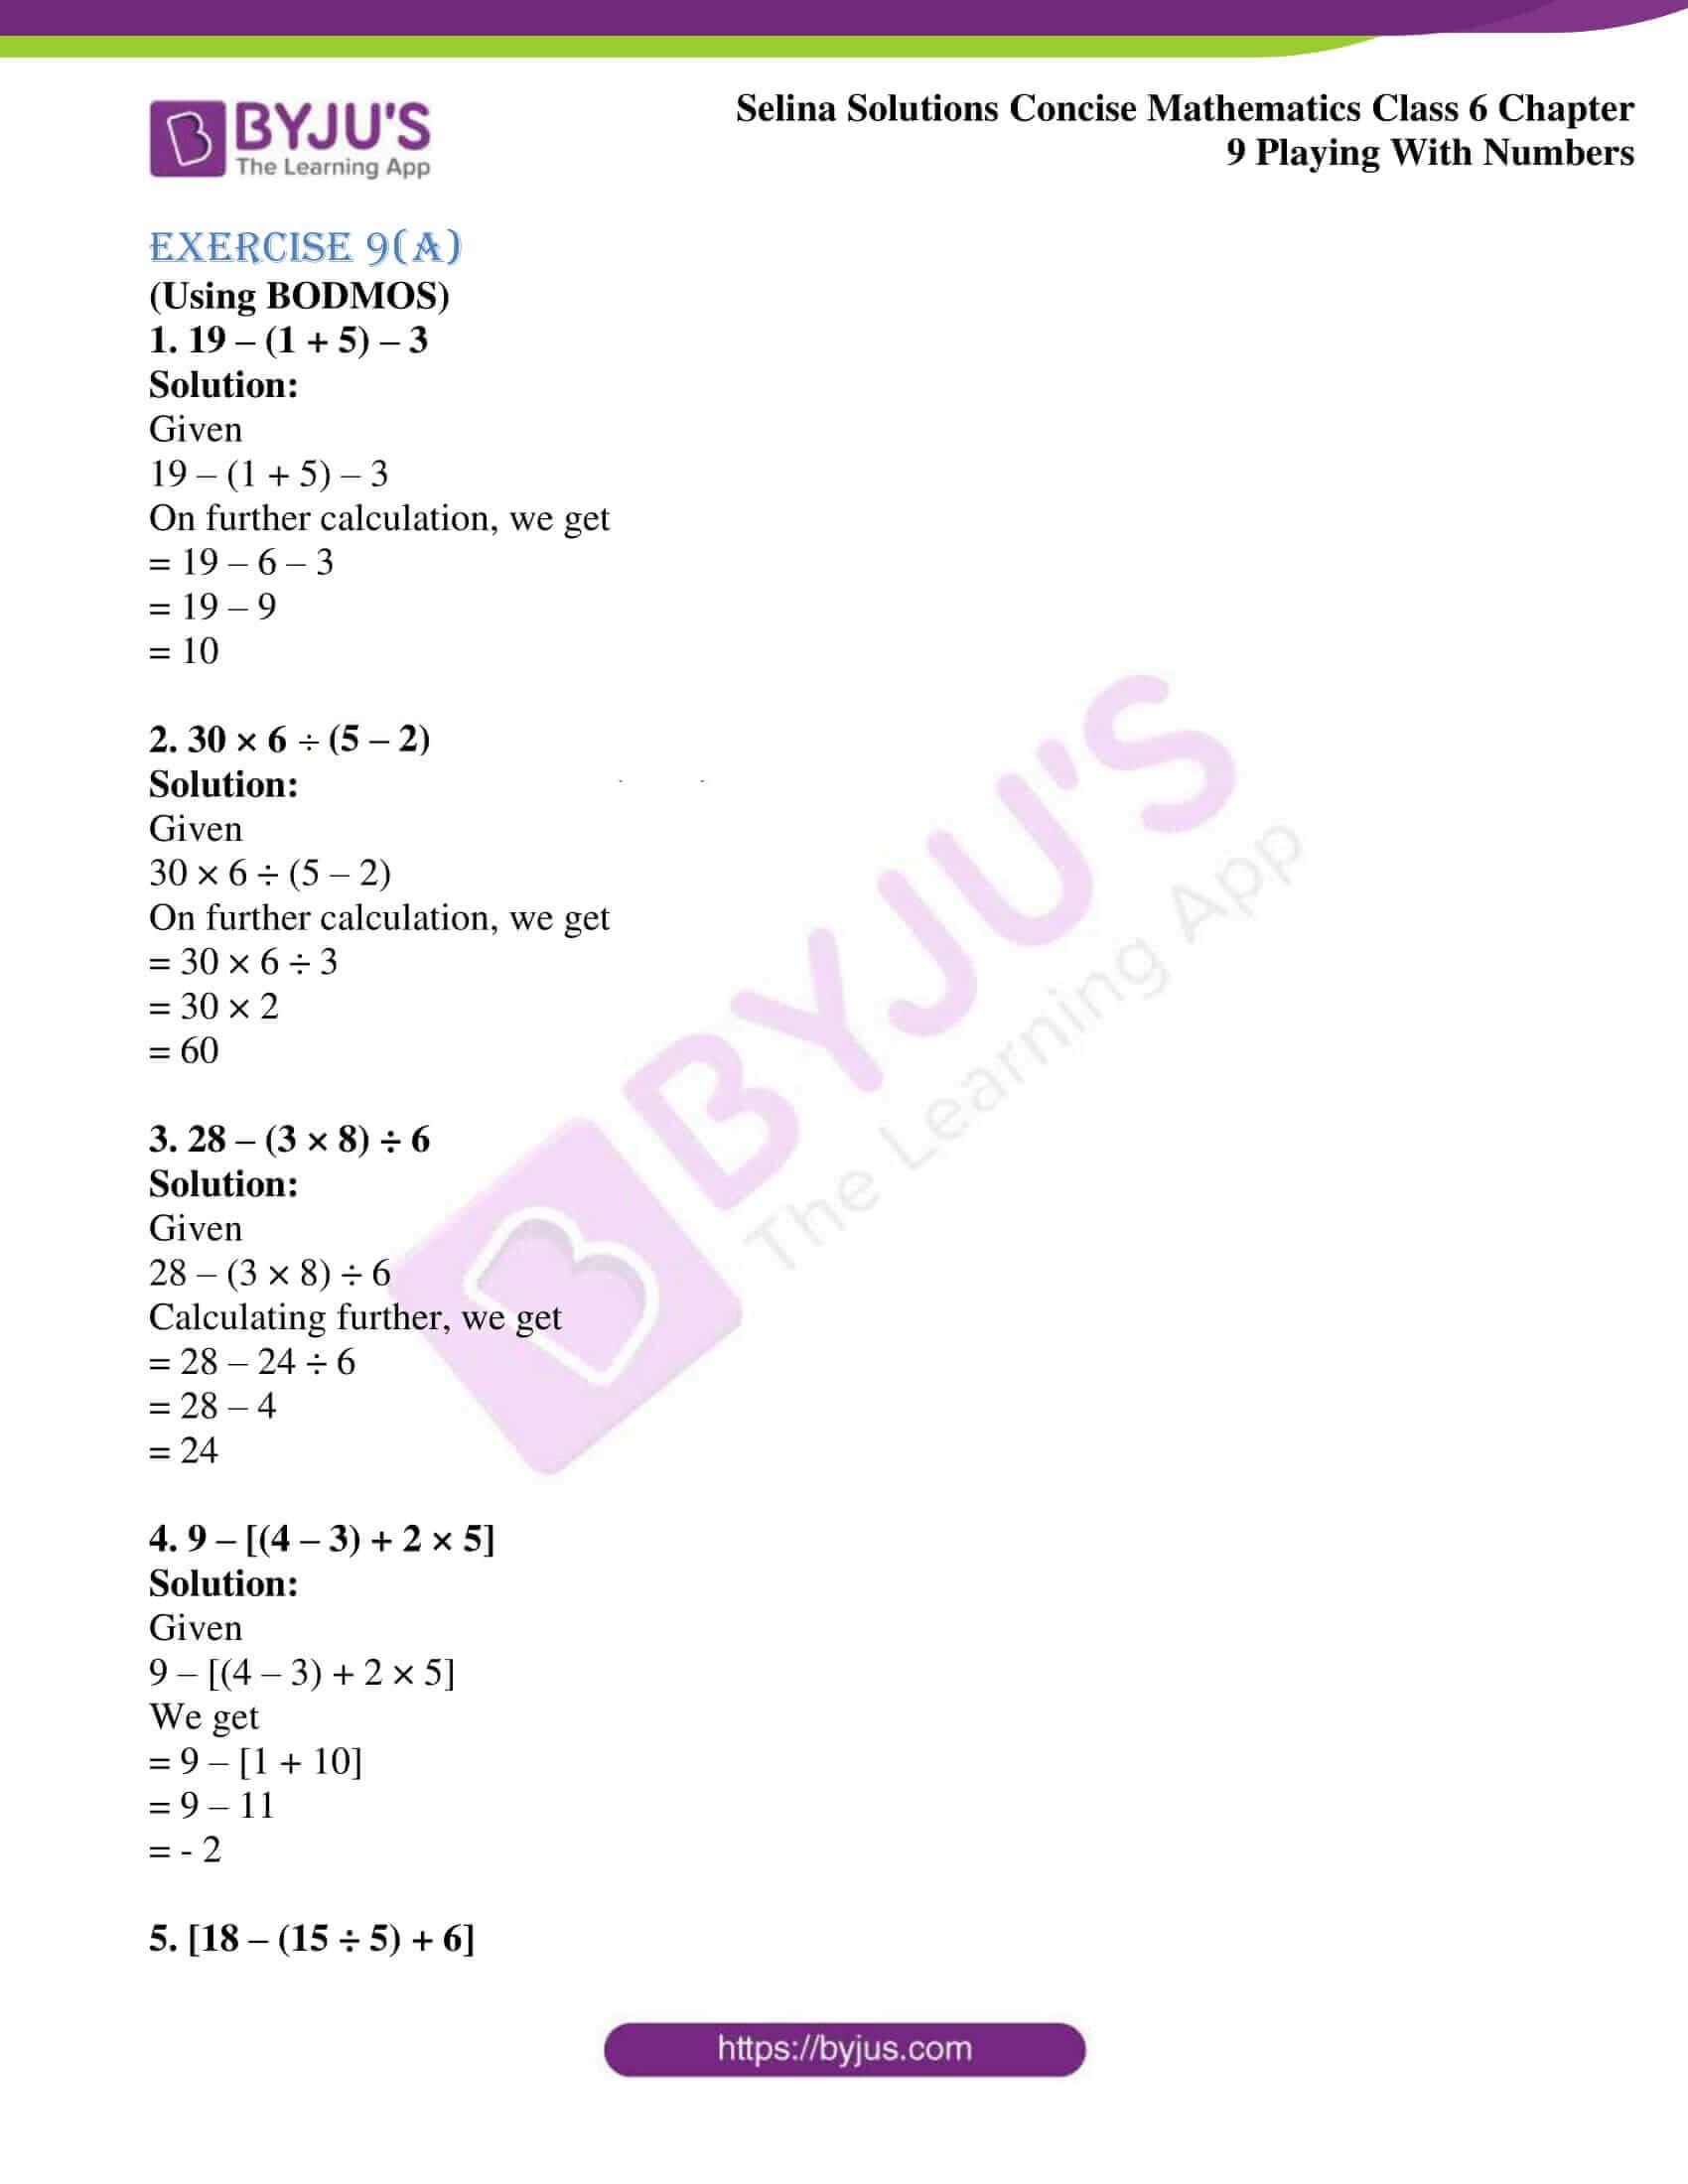 selina sol concise mathematics class 6 ch 9 ex a 1